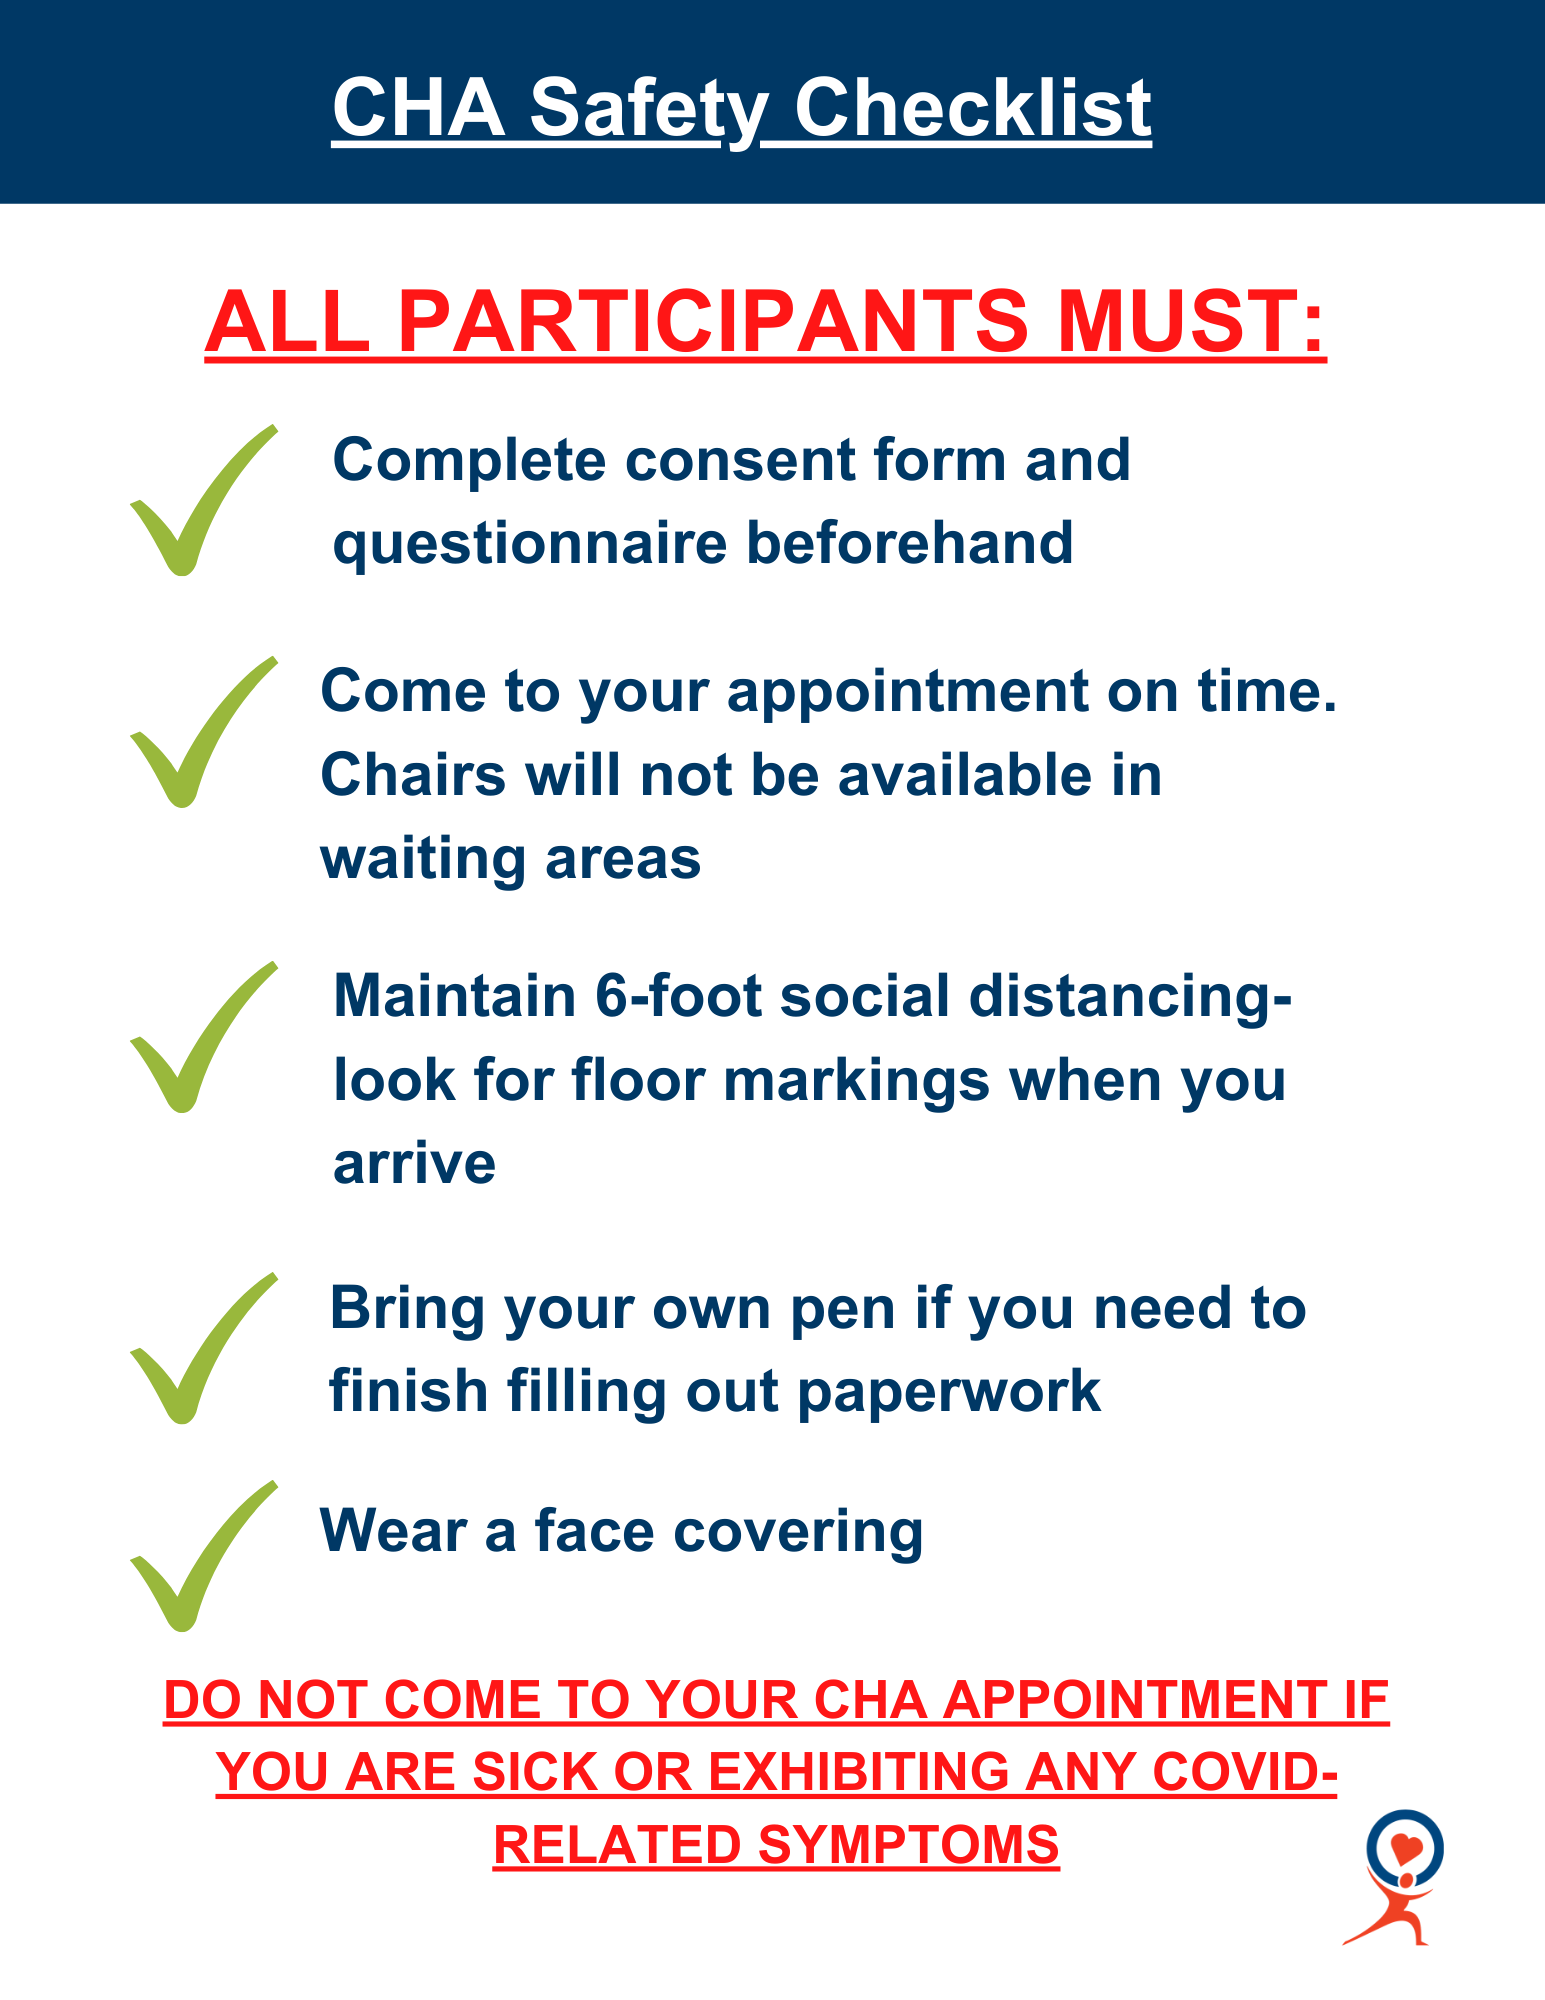 CHA Safety Checklist (1)